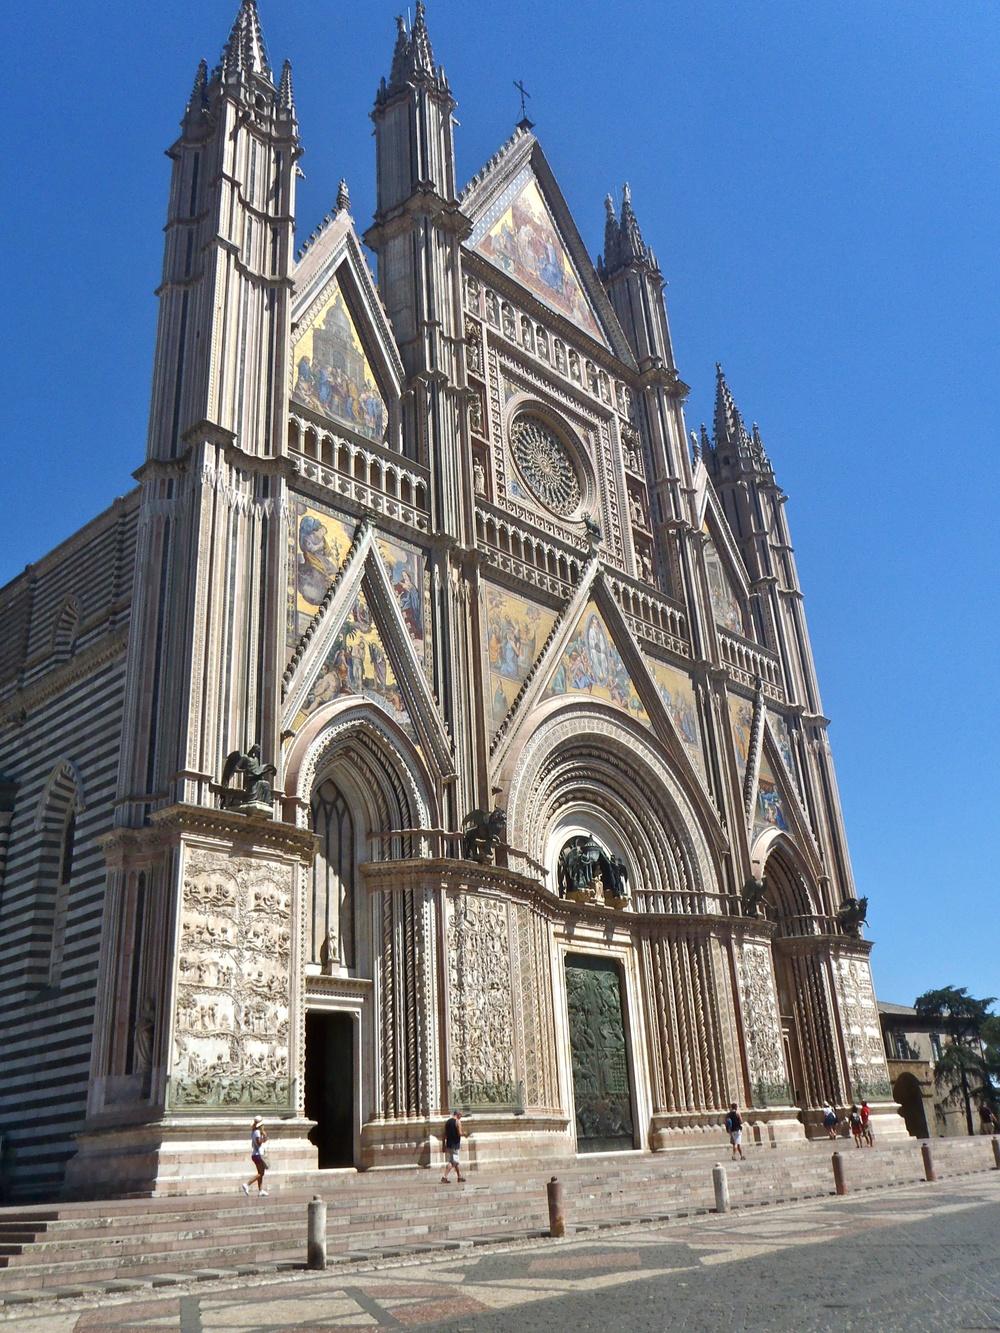 CRO Italy web 2012 - 06.jpg